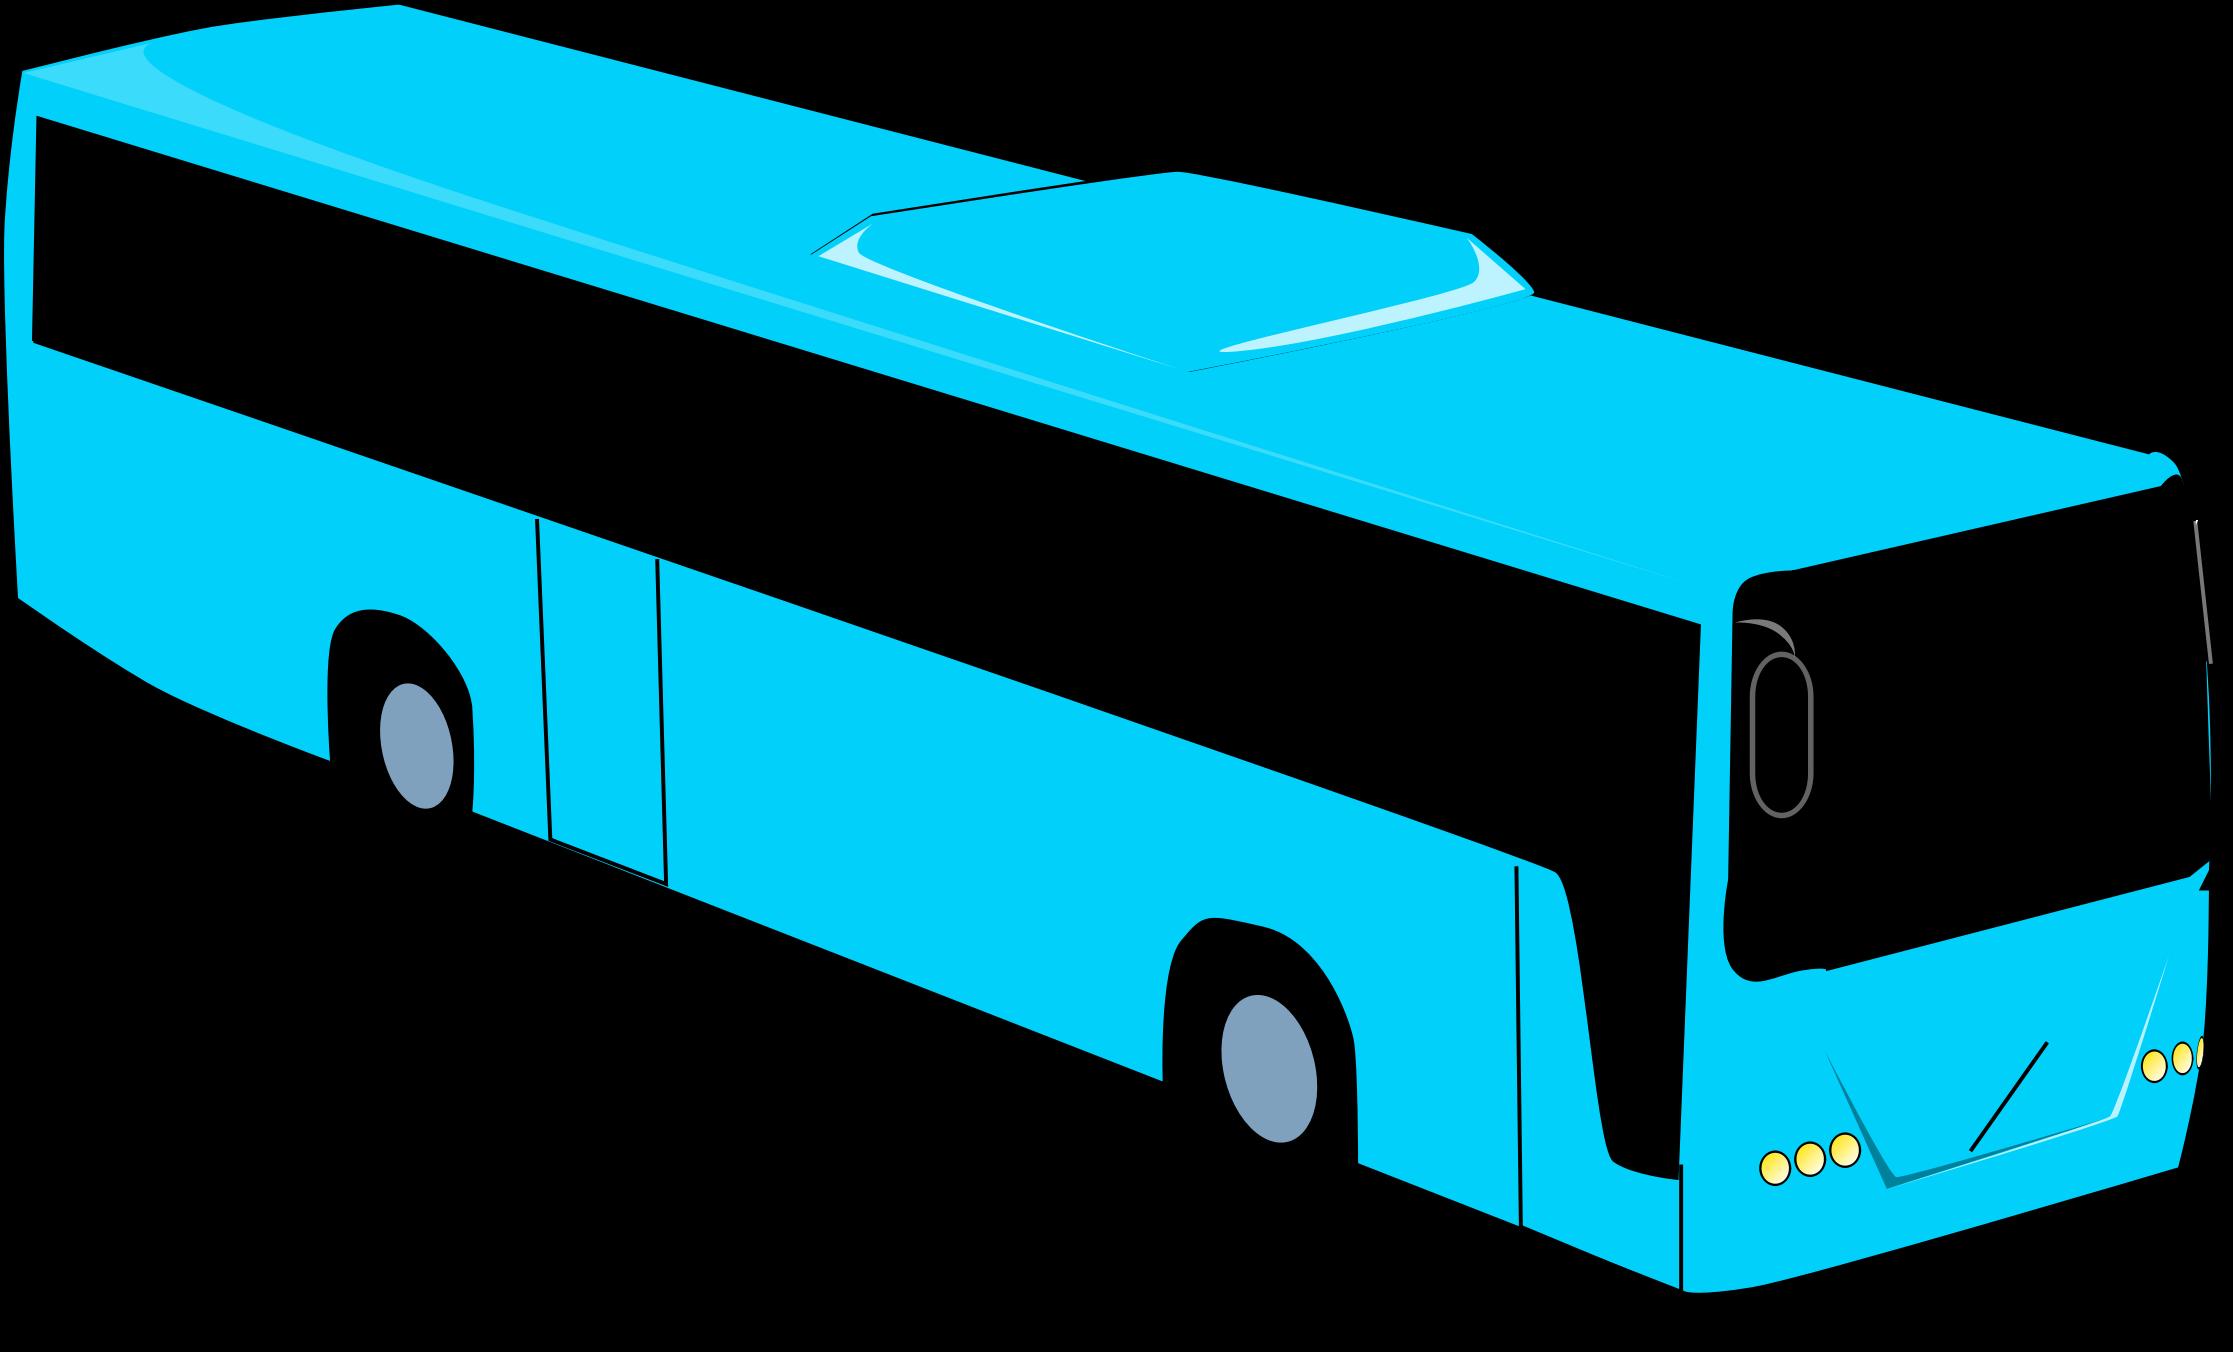 Big image png. Clipart bus long bus